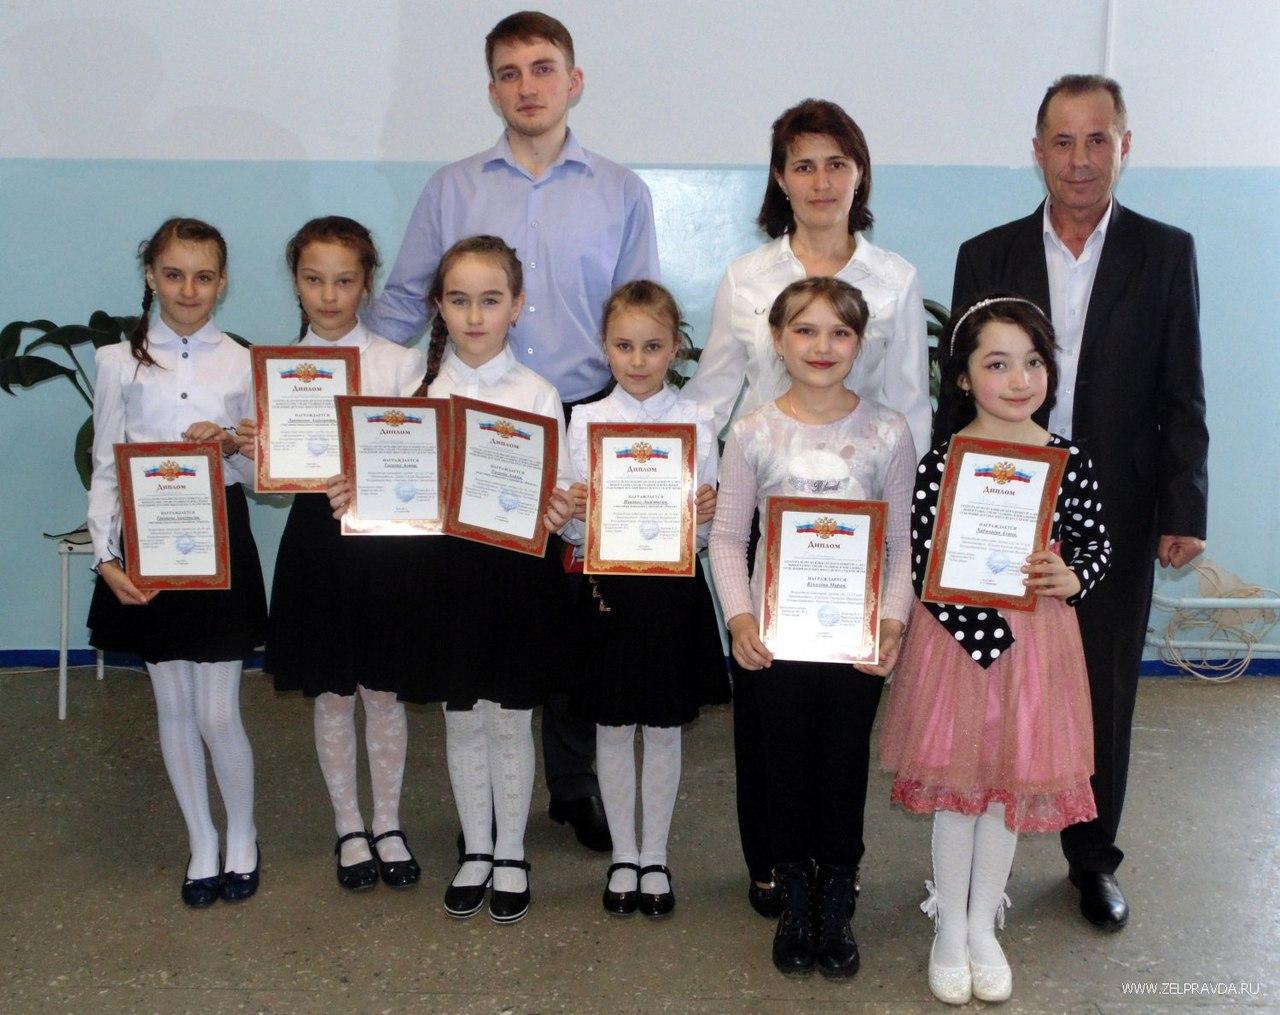 «Без фонограмм» пели дети на конкурсе в Зеленчукском районе